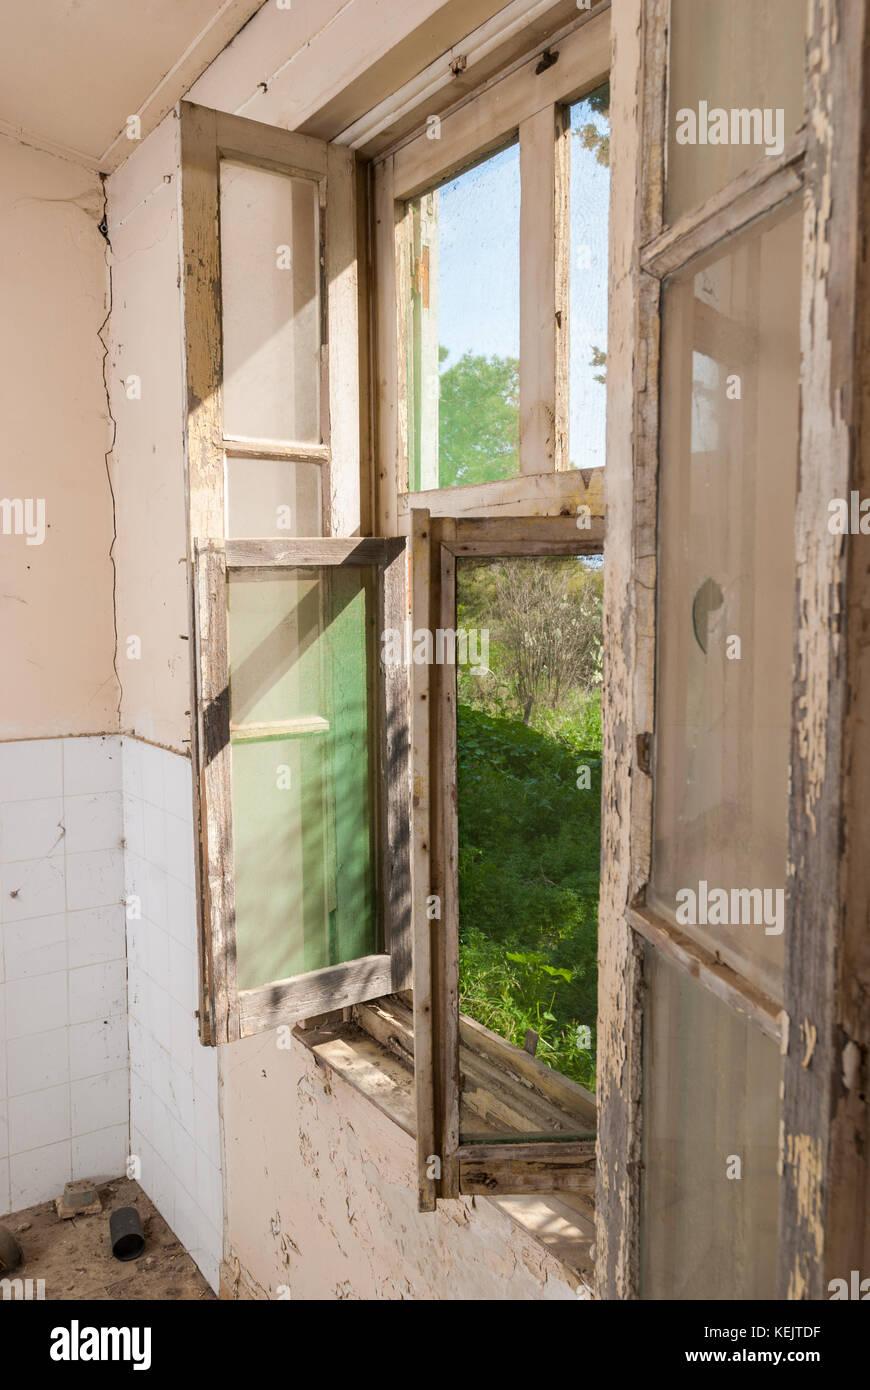 Abandoned sanatorium - hospital room - Stock Image